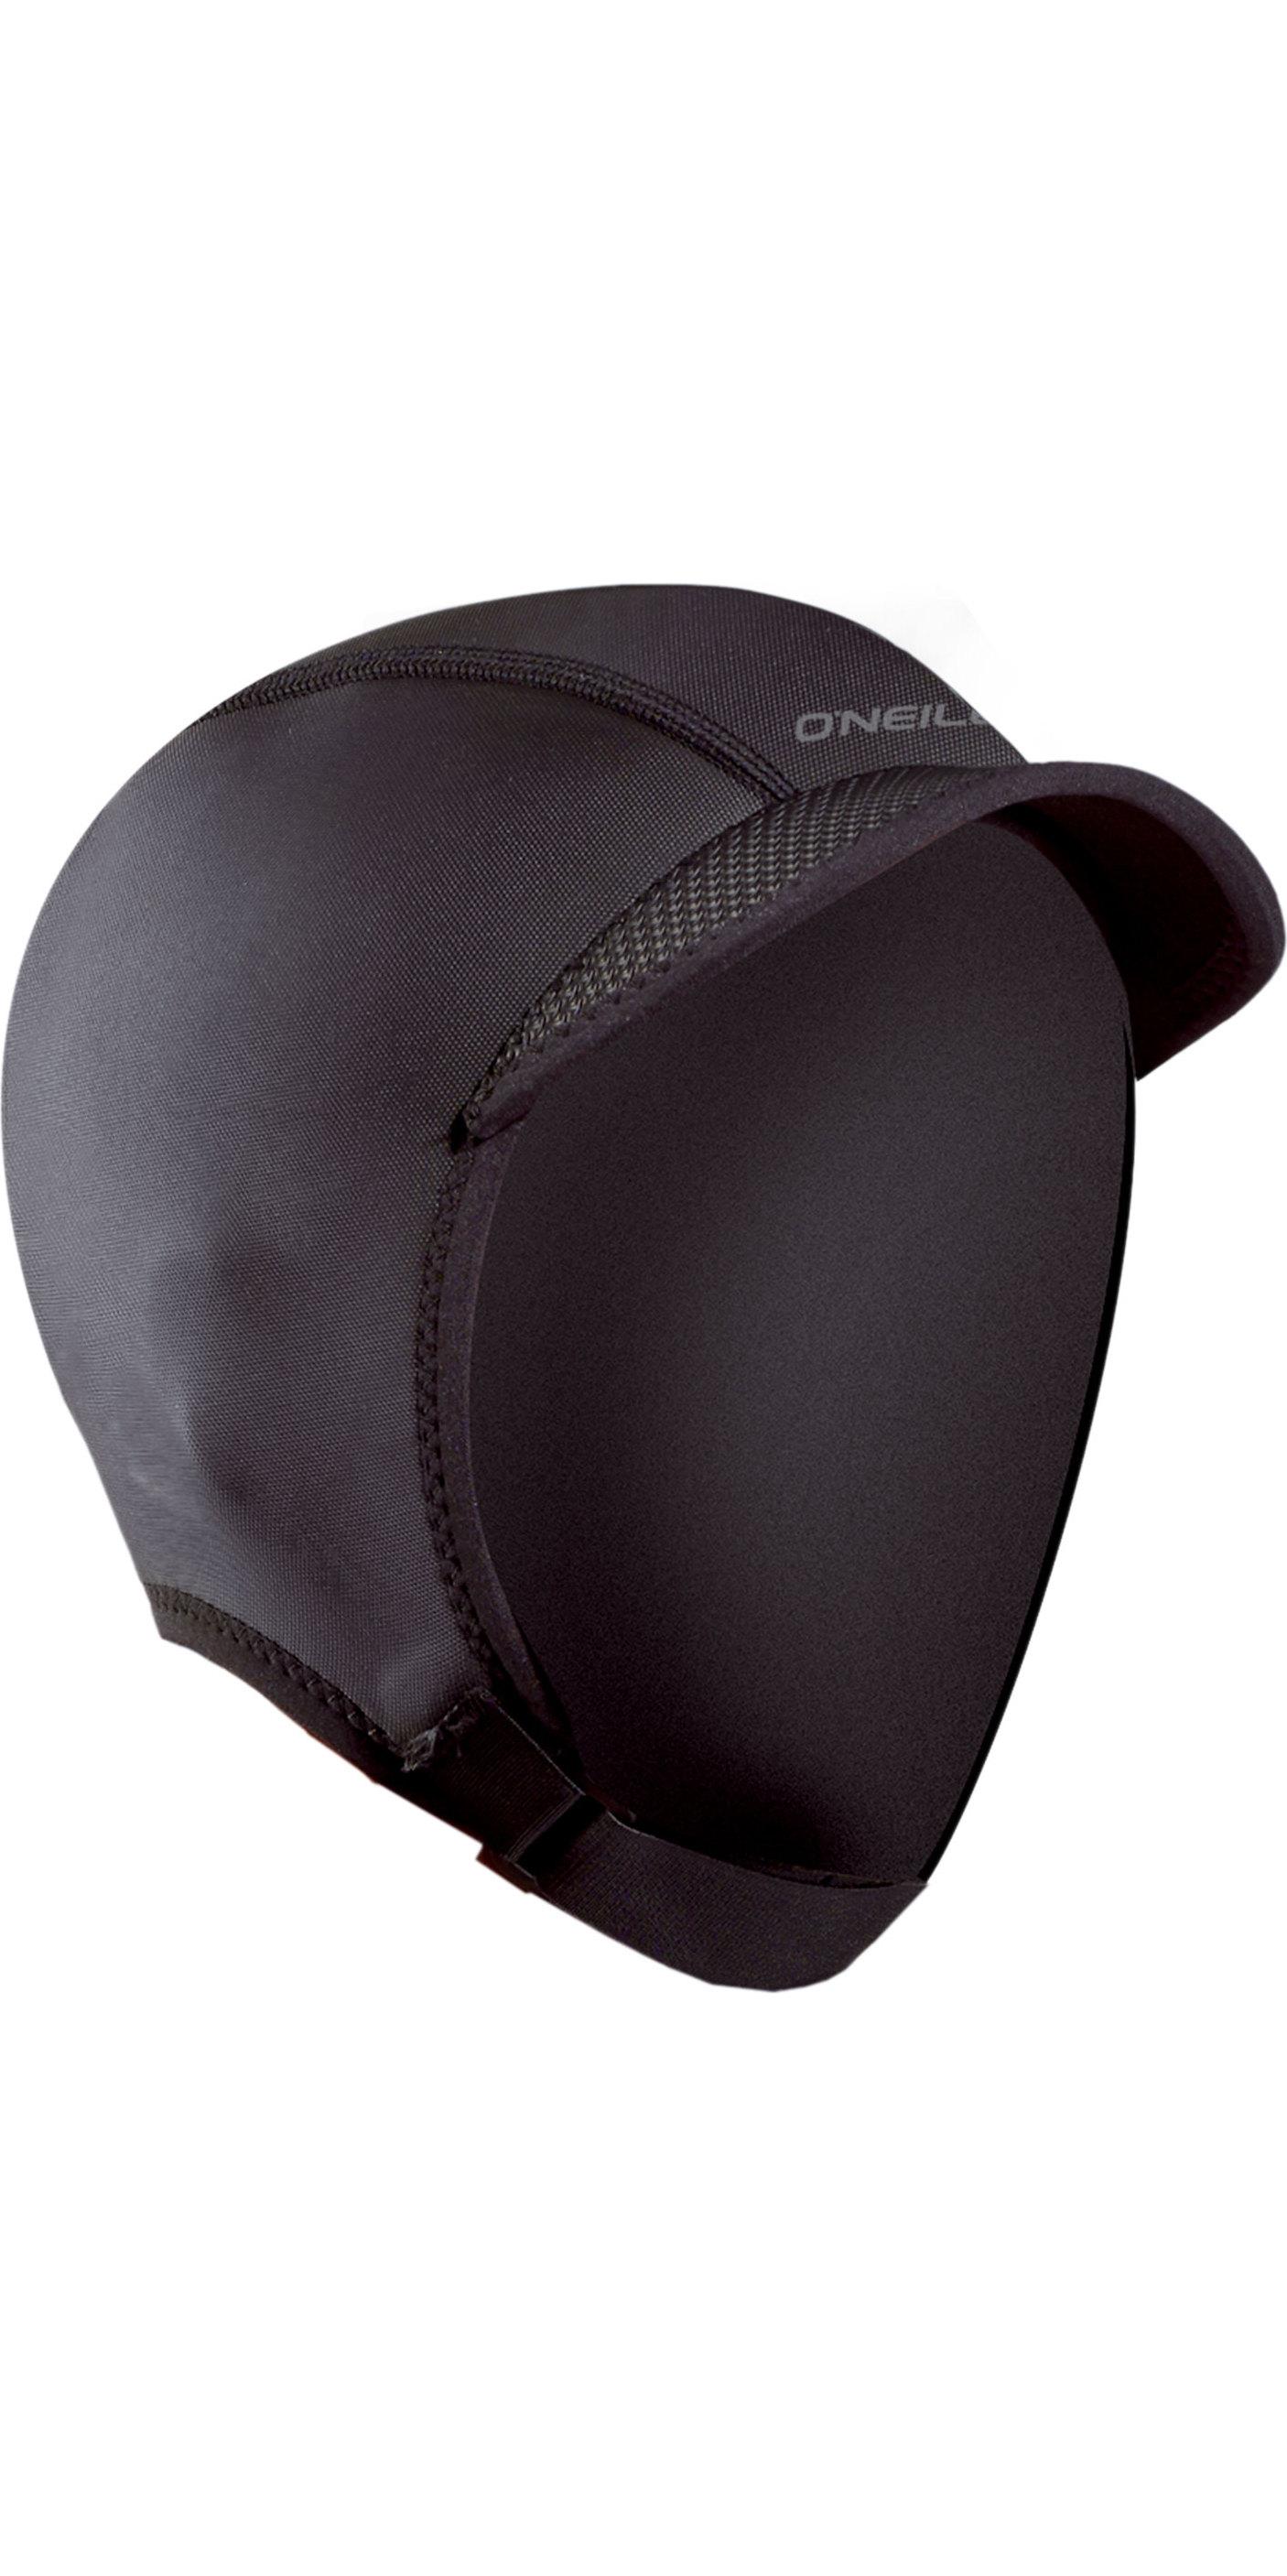 2019 O'Neill 2mm Sport Neoprene Cap Black 5109